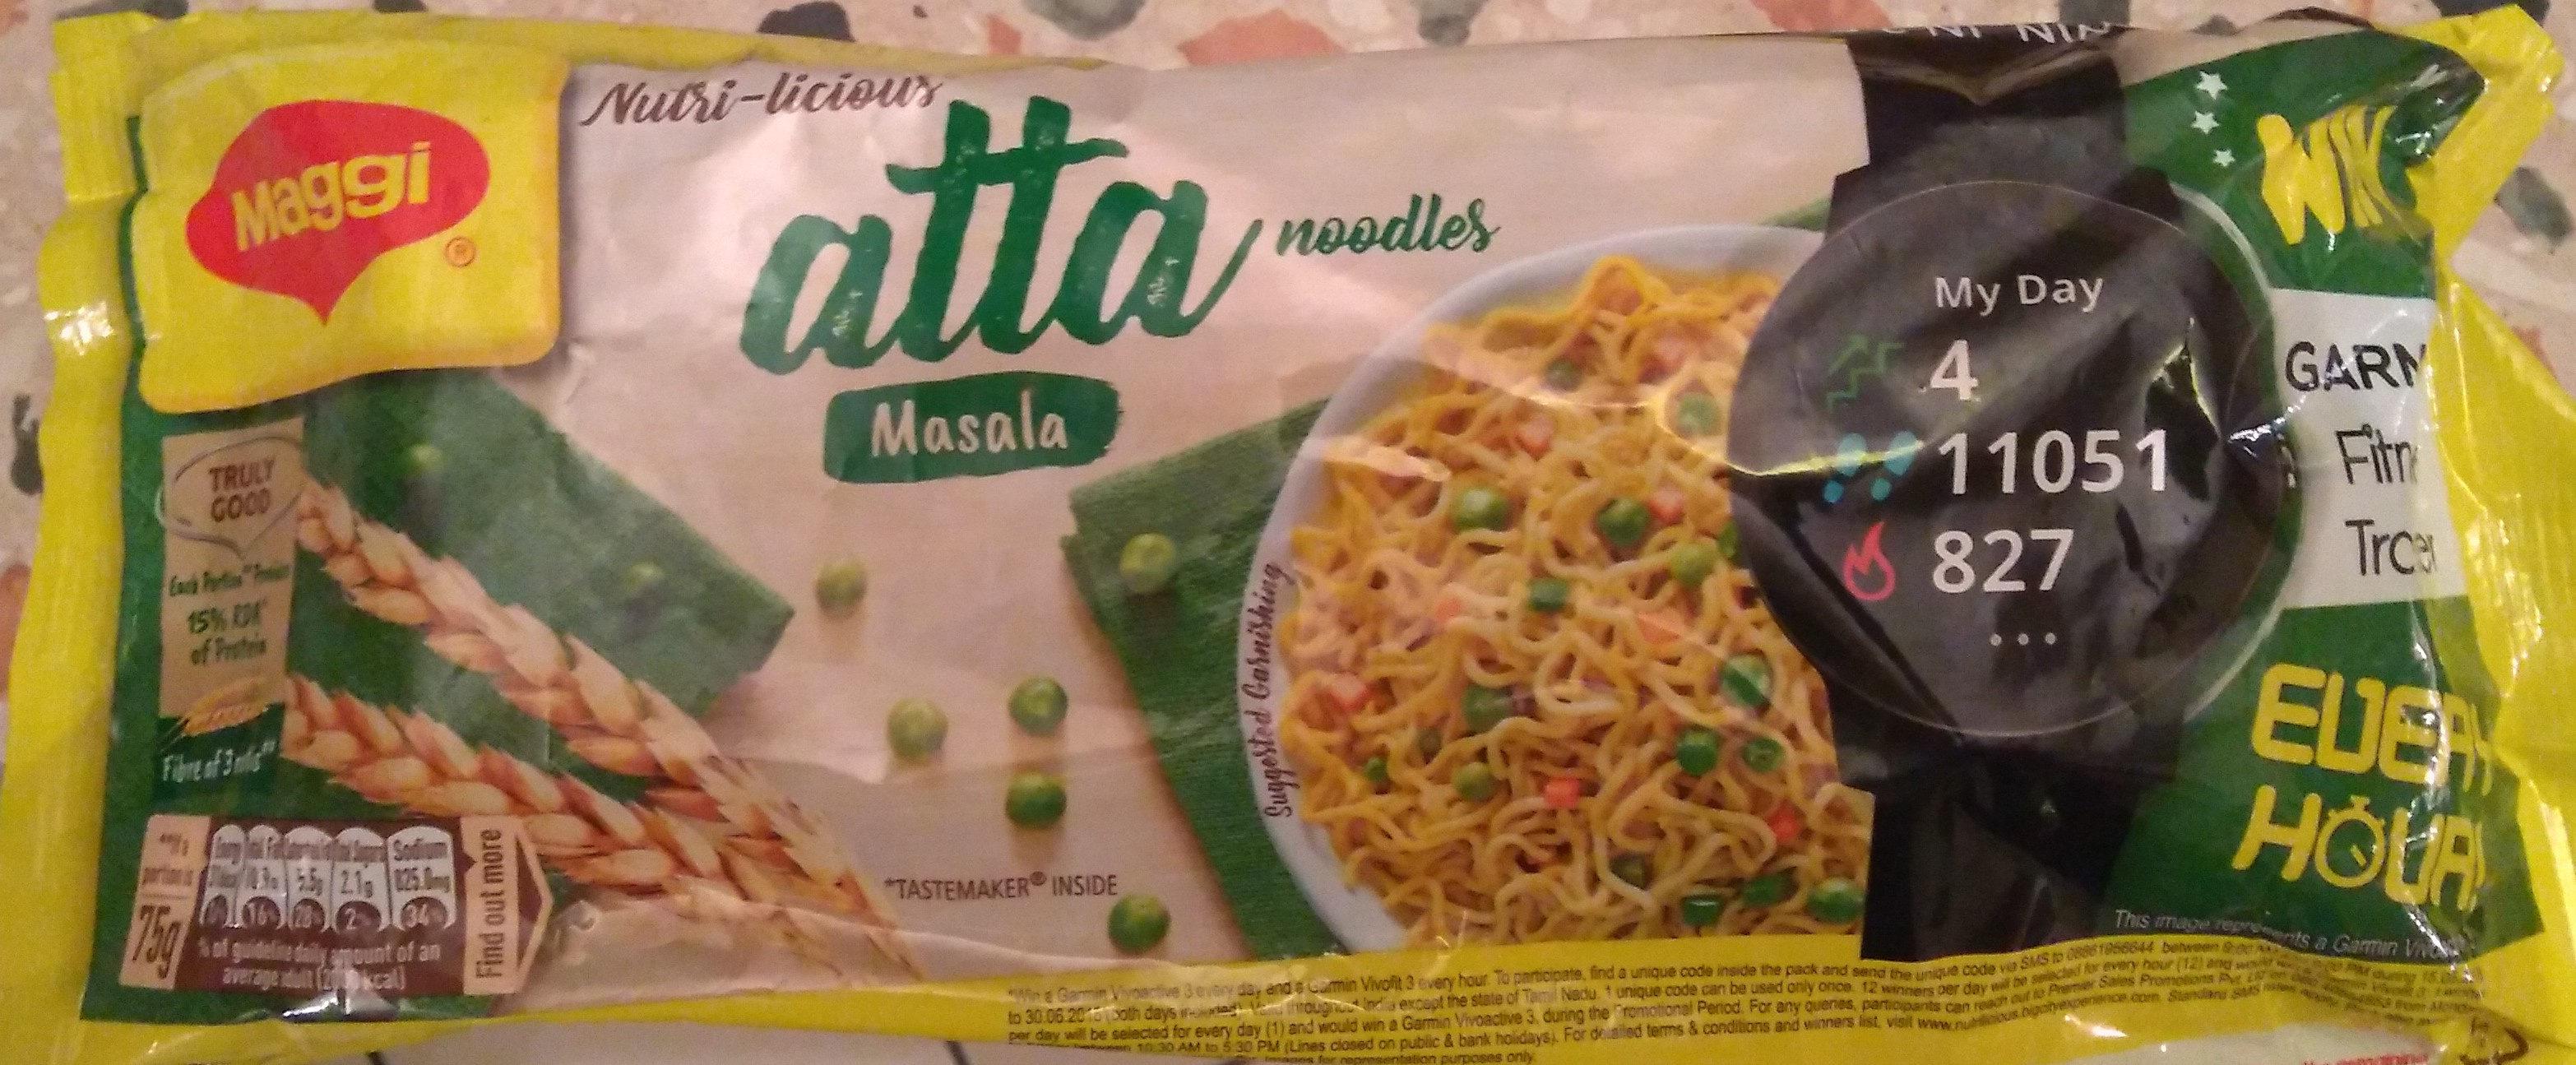 Maggi Atta noodle - Masala - Produit - en